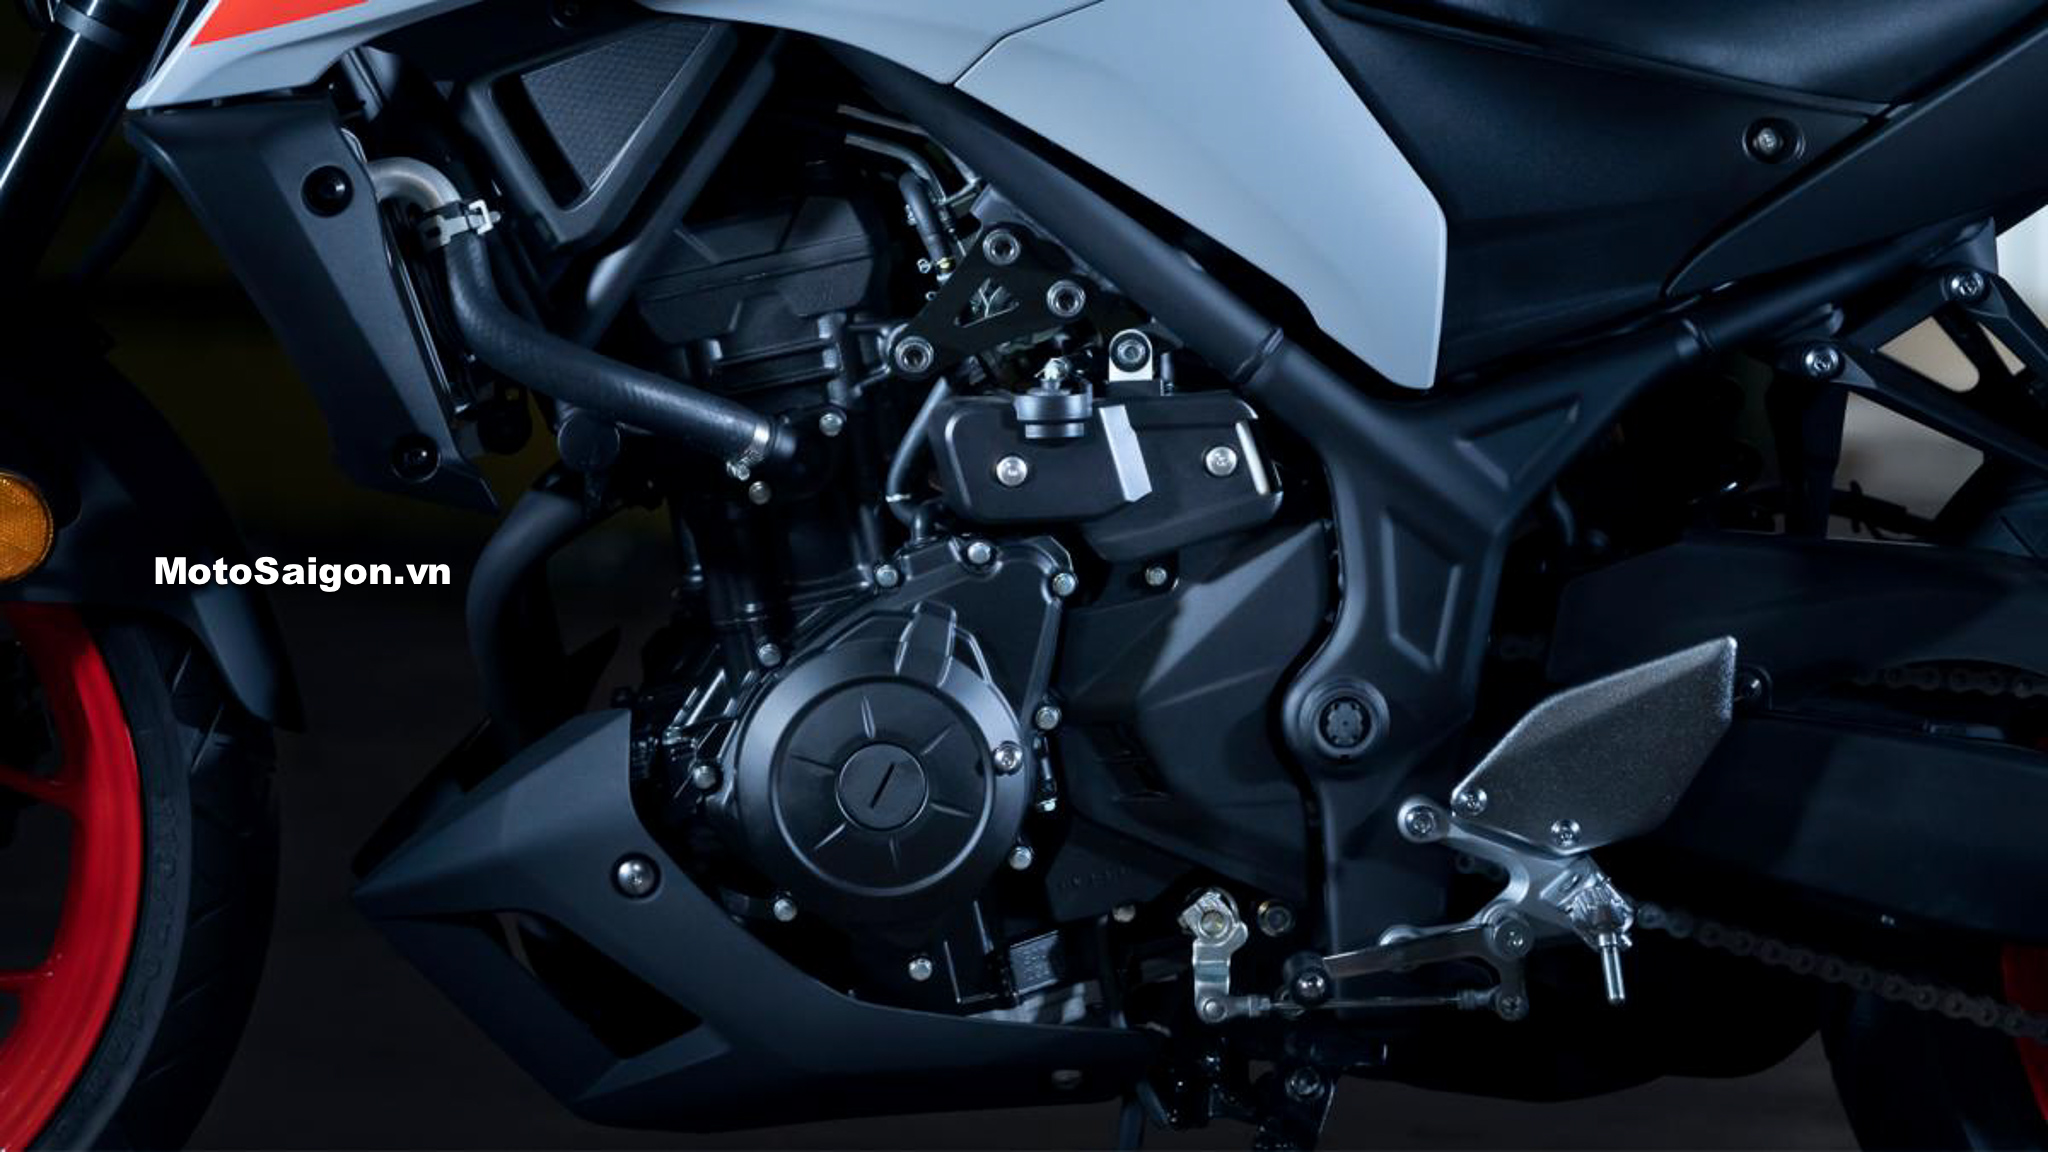 yamaha mt 03 abs 2020 danh gia xe motosaigon 11